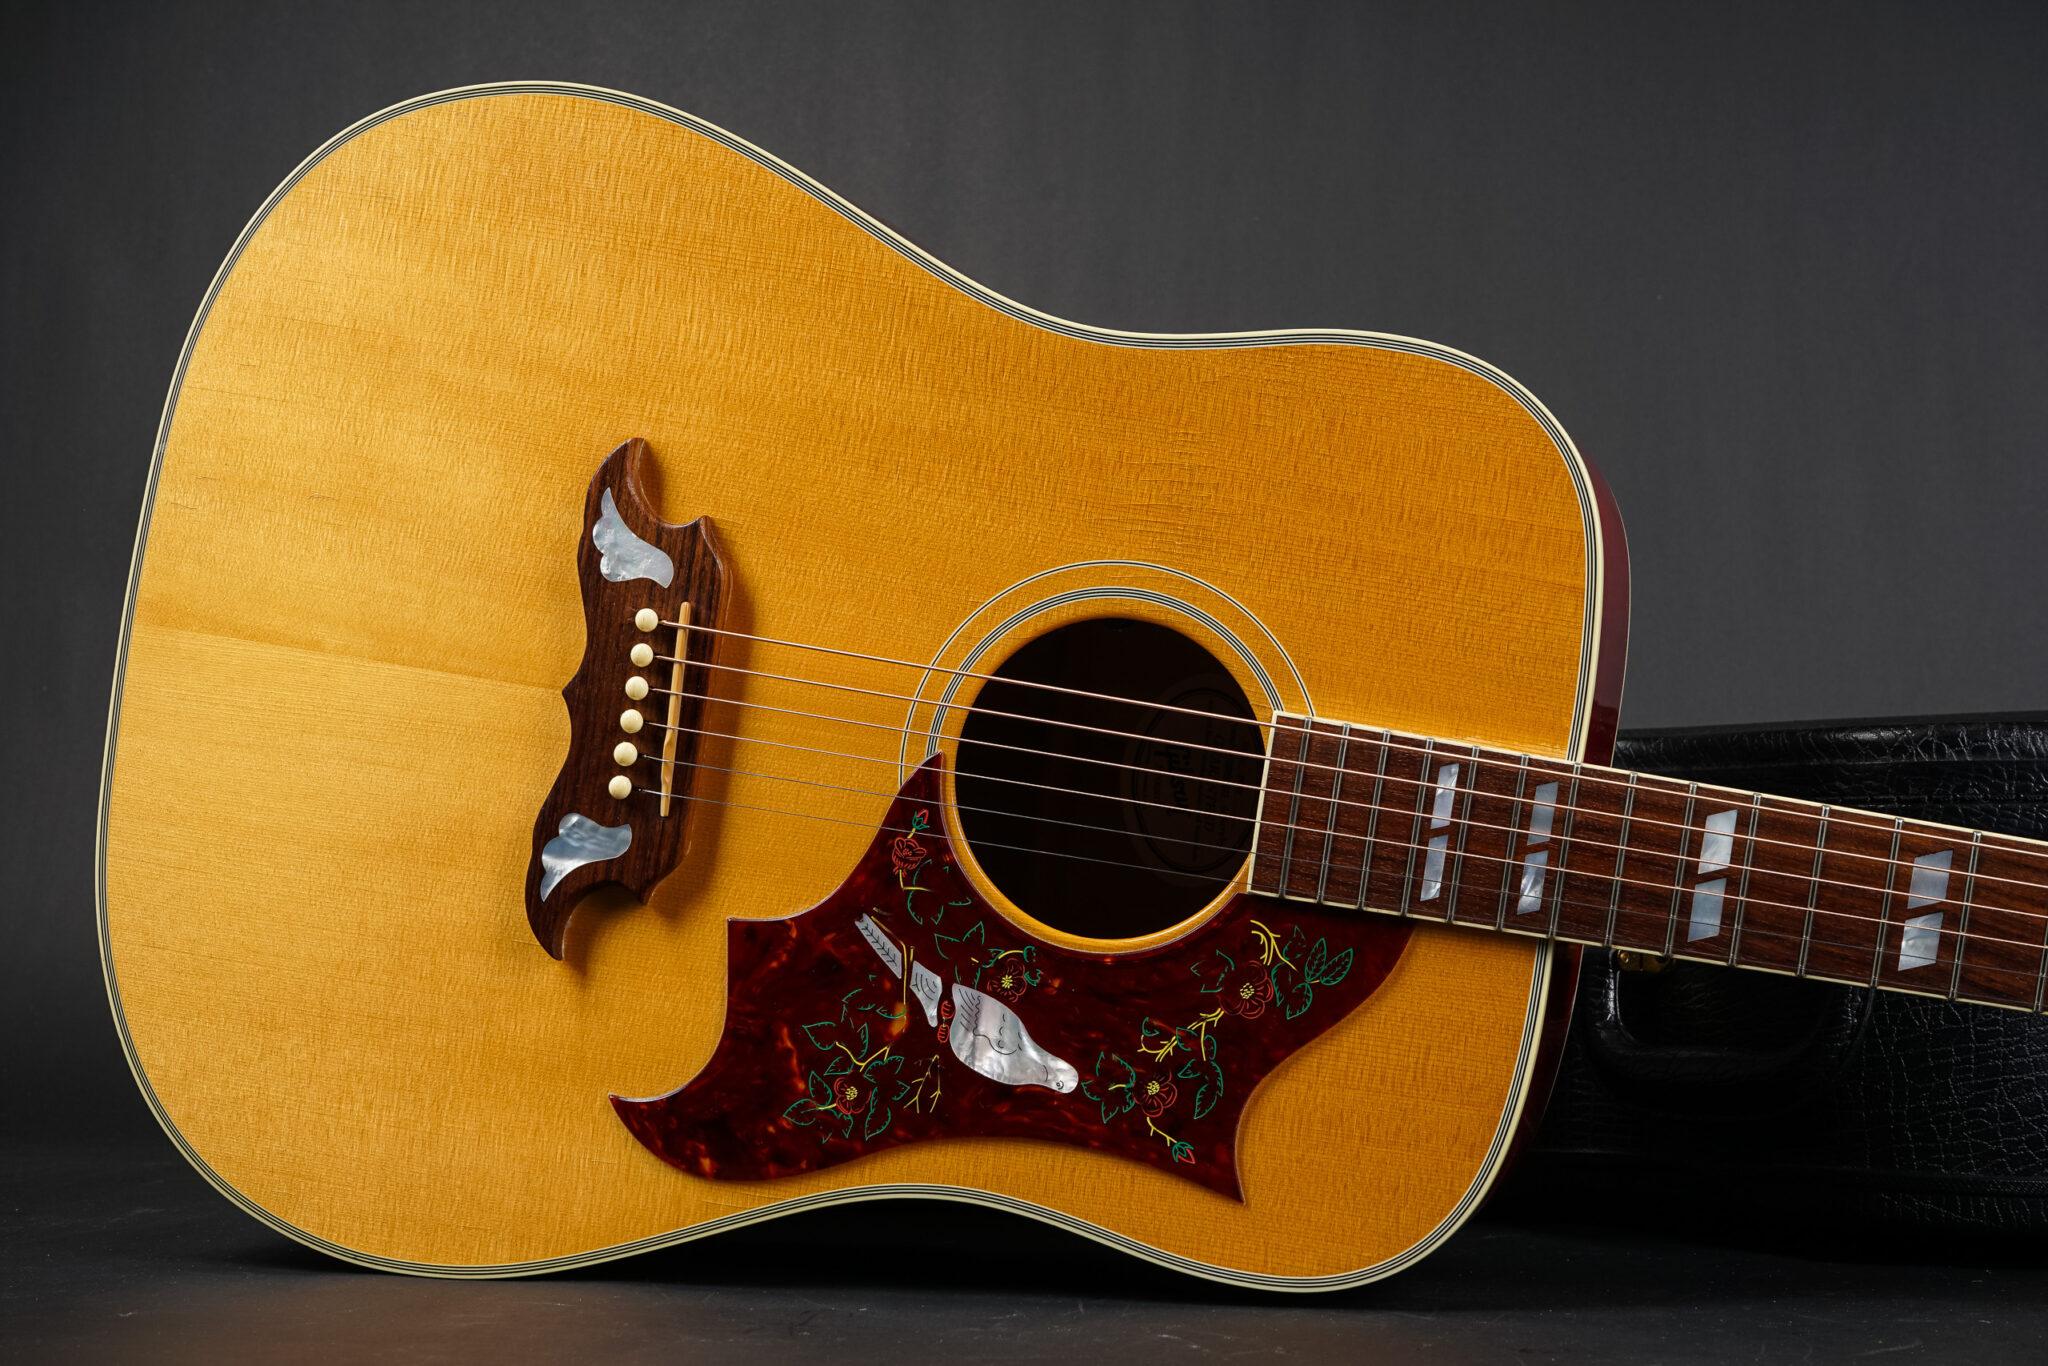 https://guitarpoint.de/app/uploads/products/2007-gibson-dove-natural/2007-Gibson-Dove-Natural-00857021-9-2048x1366.jpg